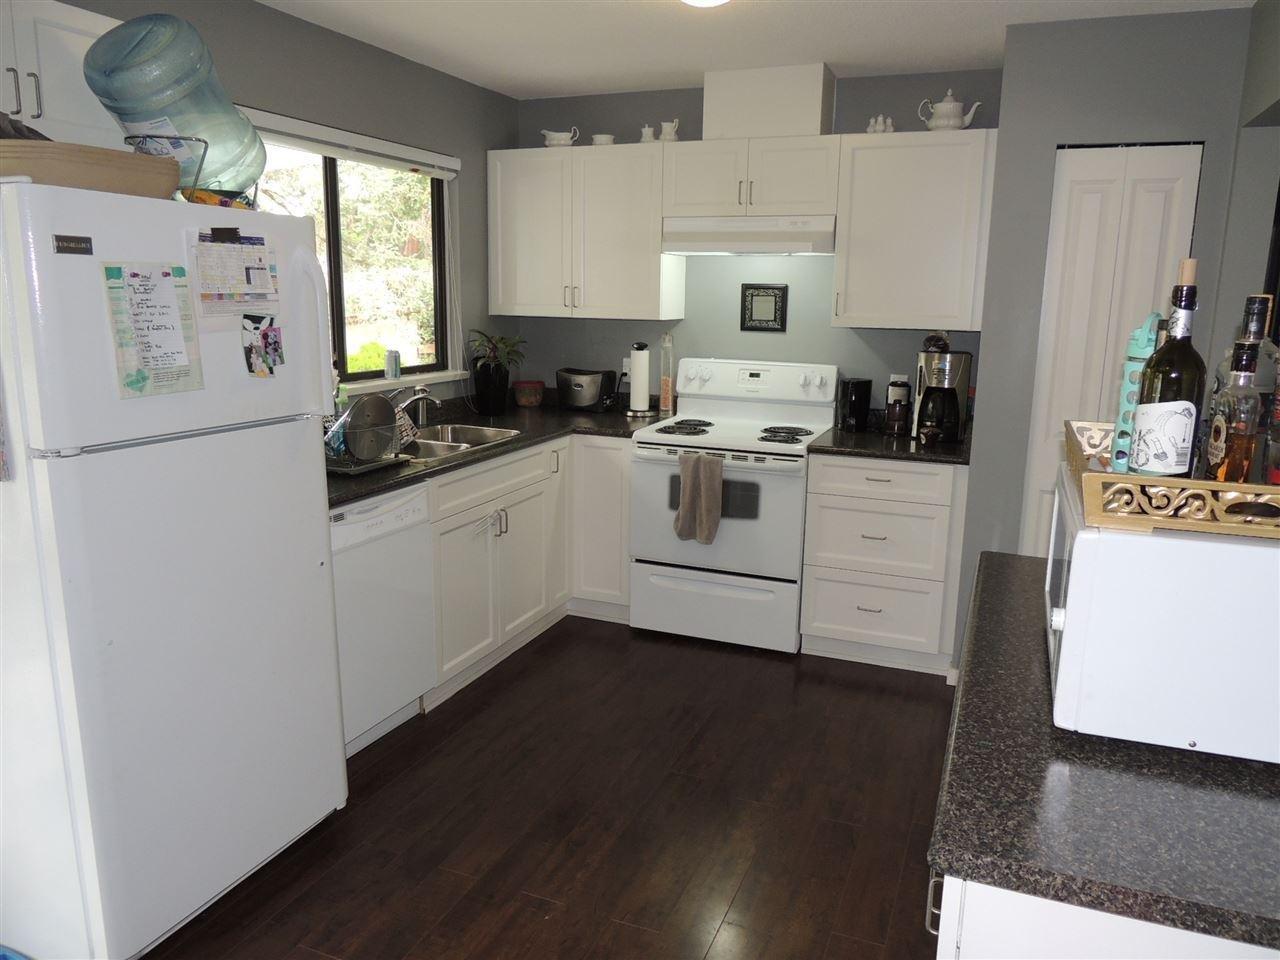 R2114652 - 5341 200A STREET, Langley City, Langley, BC - House/Single Family